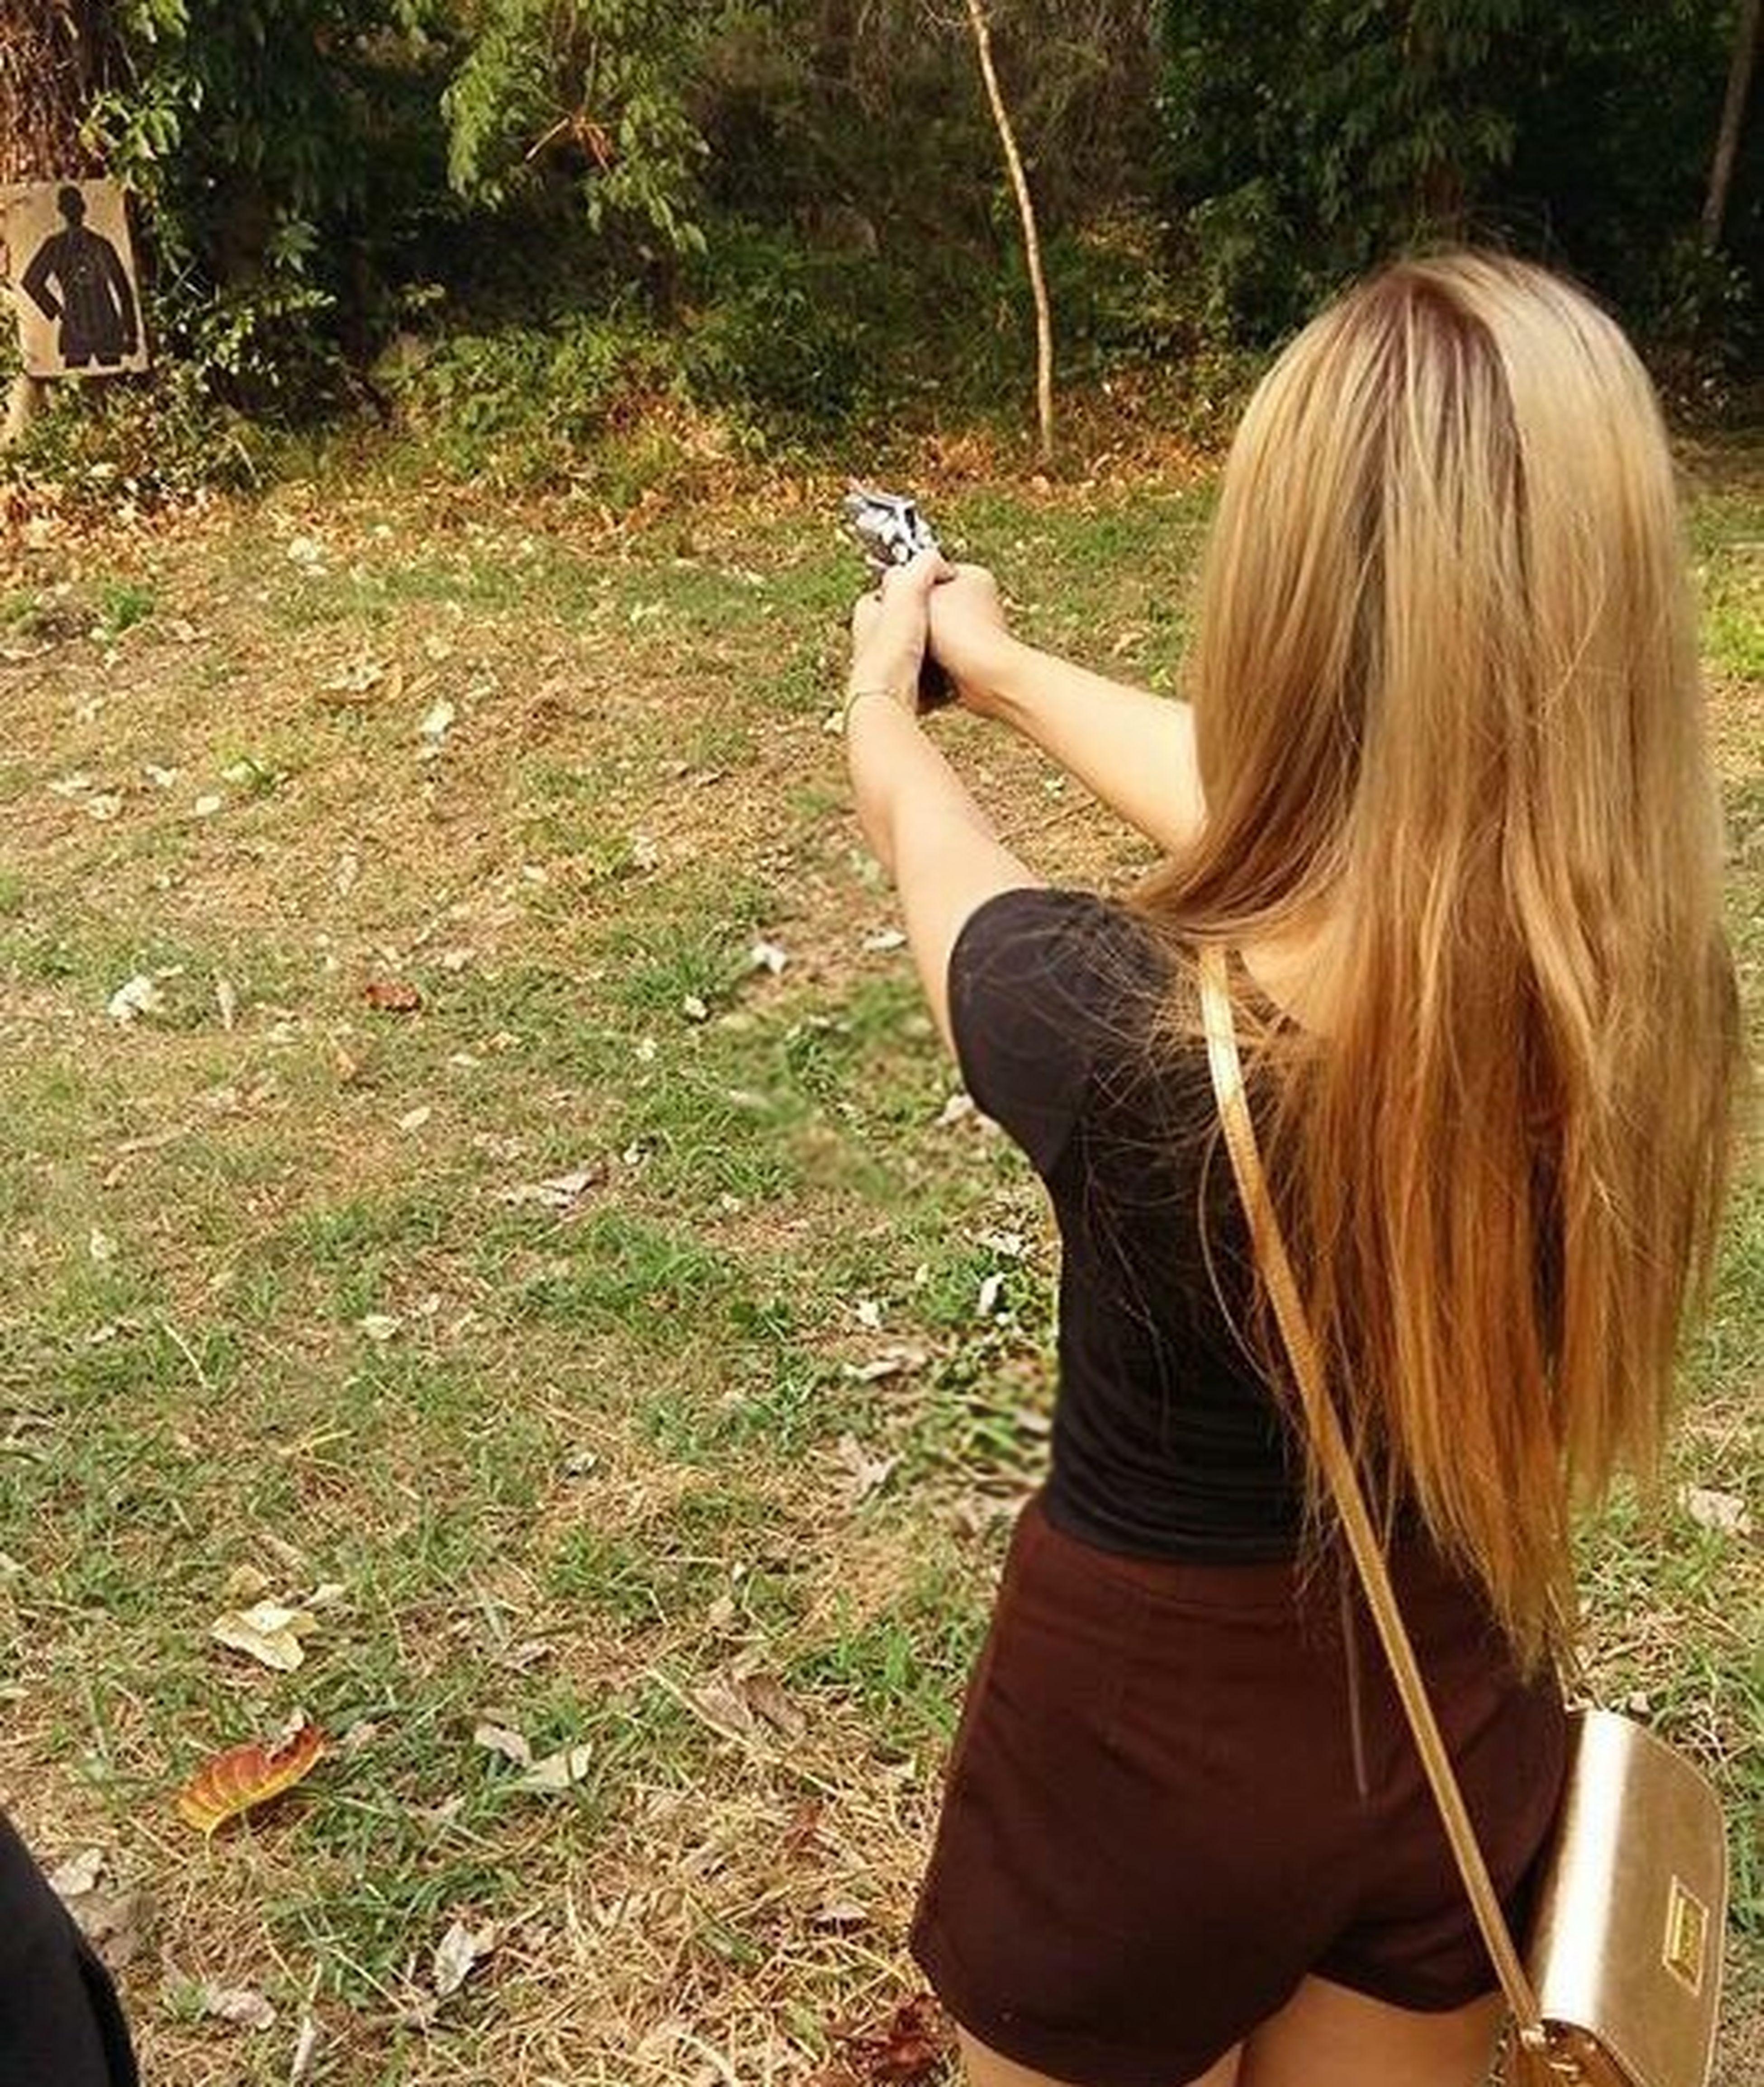 🔫 Hello World Good Morning That's Me Thaigirl Enjoying Life Relaxing Love It 38 Smith Smith Gun